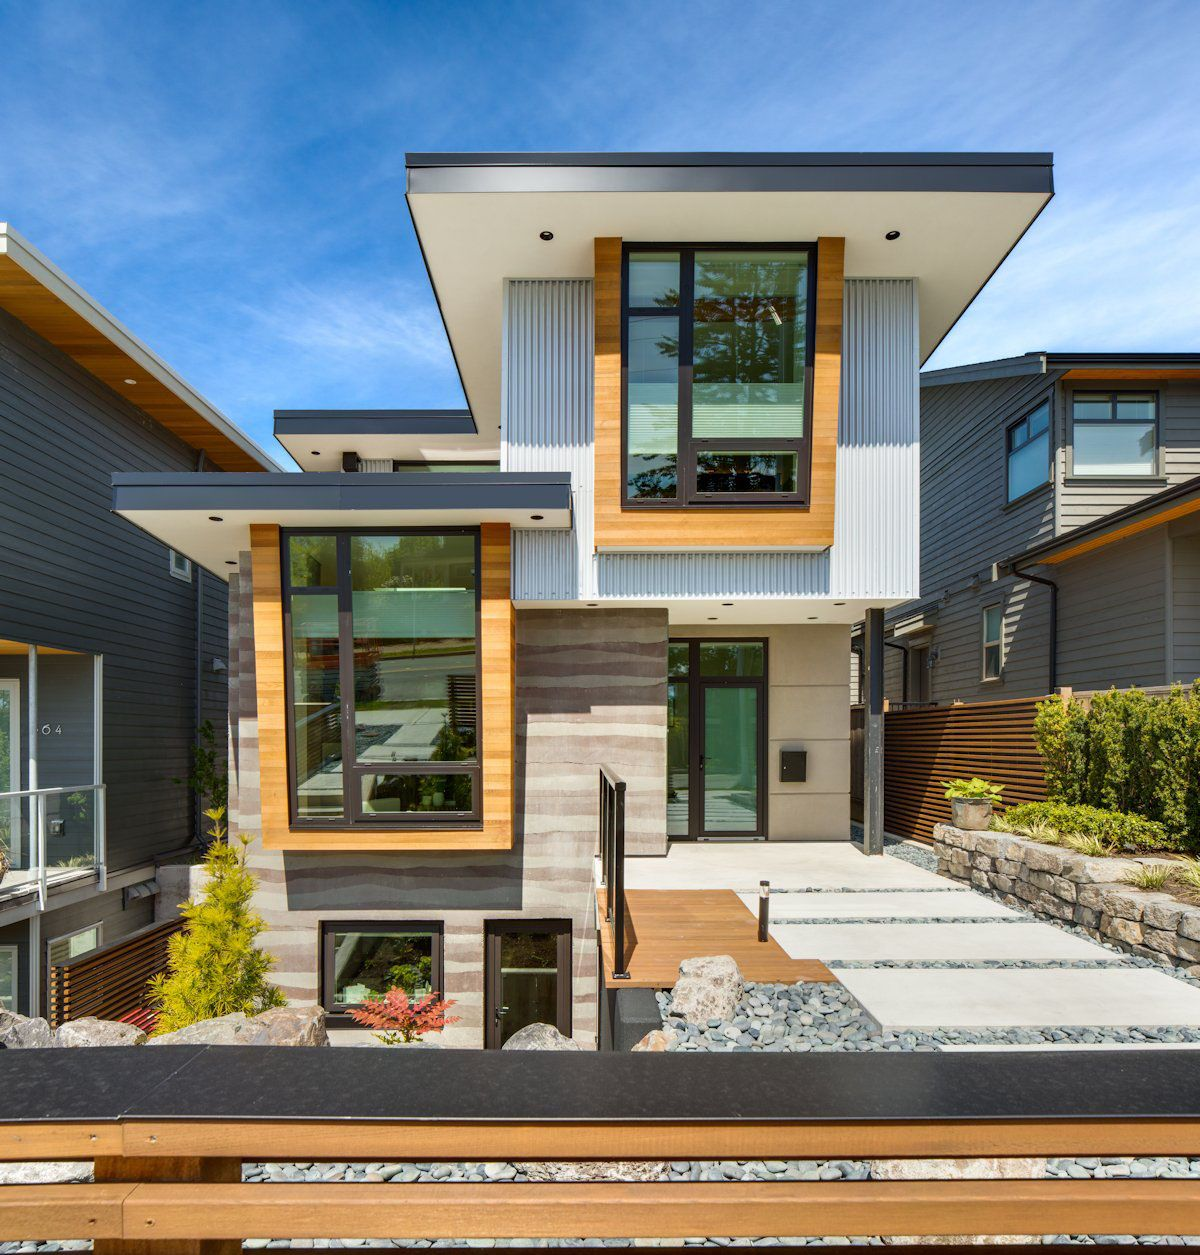 Award Winning High Class Ultra Green Home Design In Canada: Midori Uchi